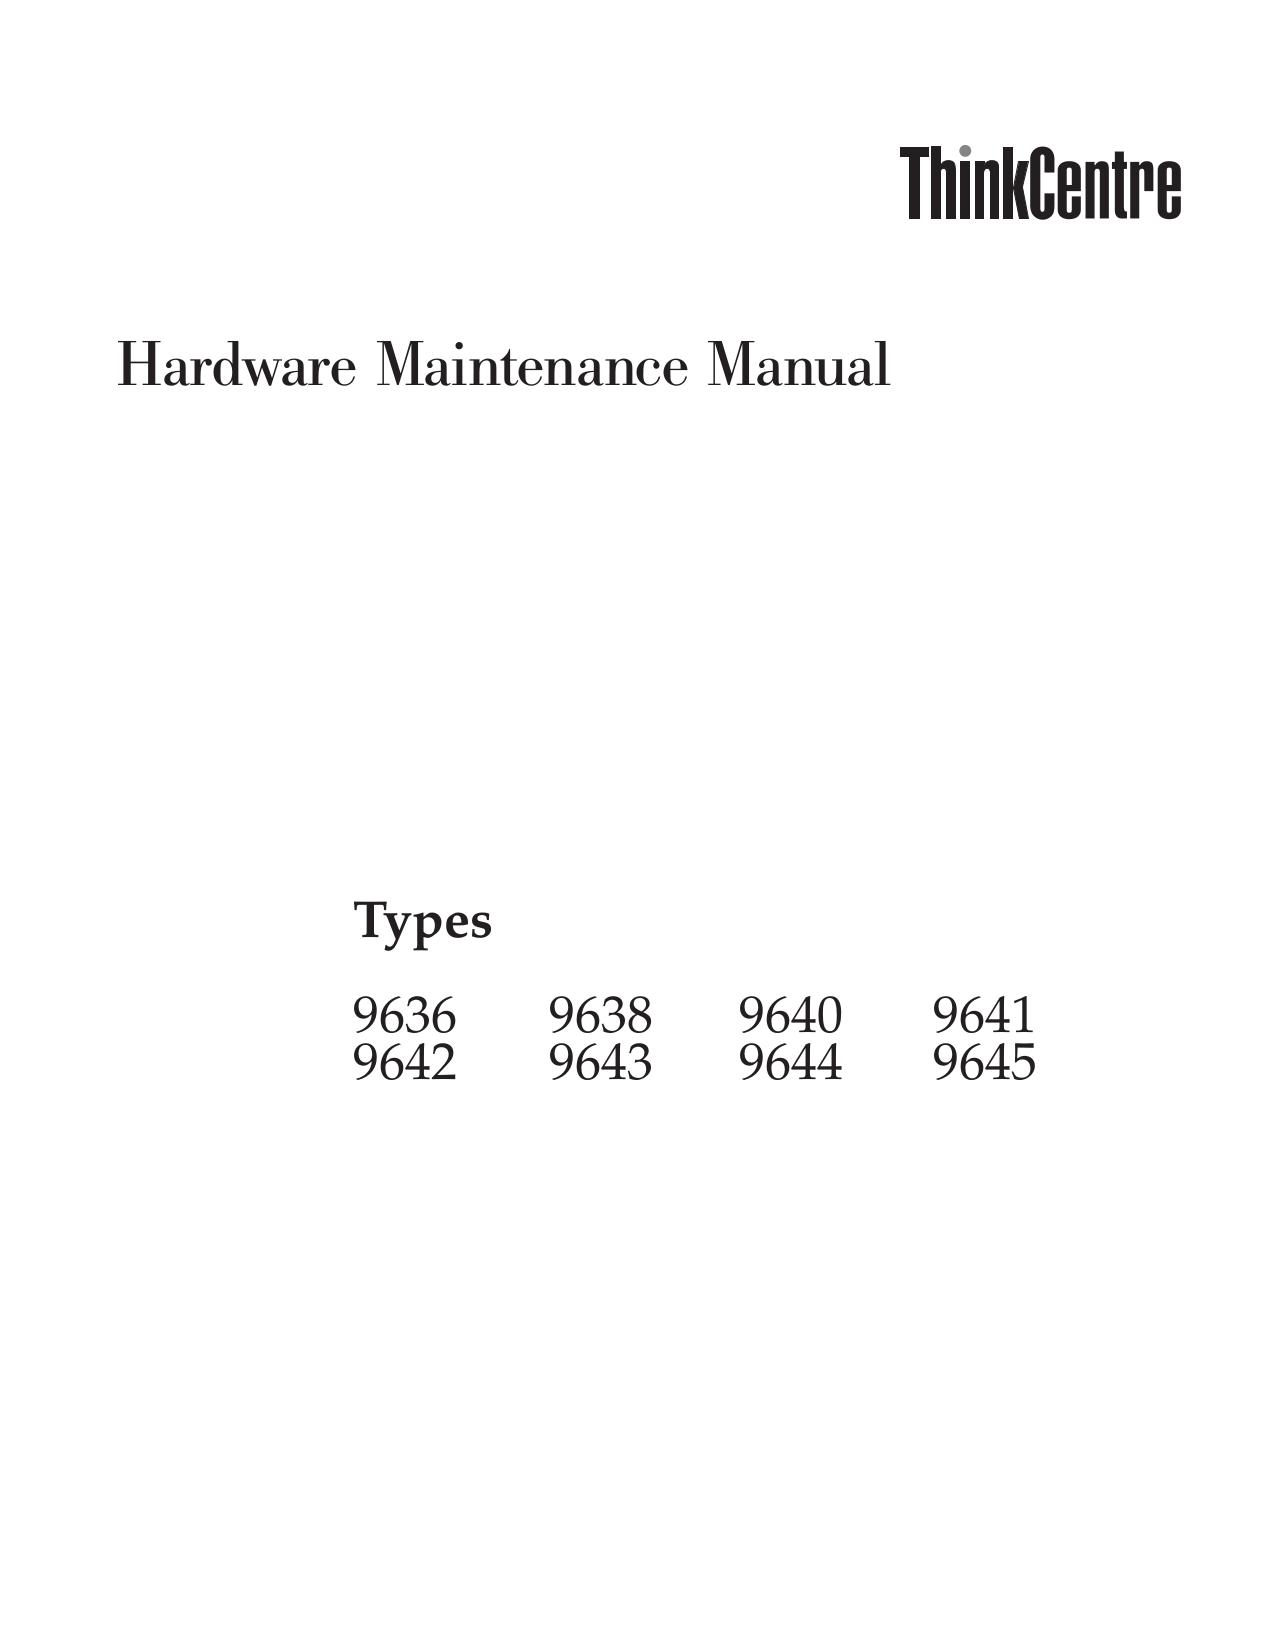 pdf for Lenovo Desktop ThinkCentre A55 9641 manual